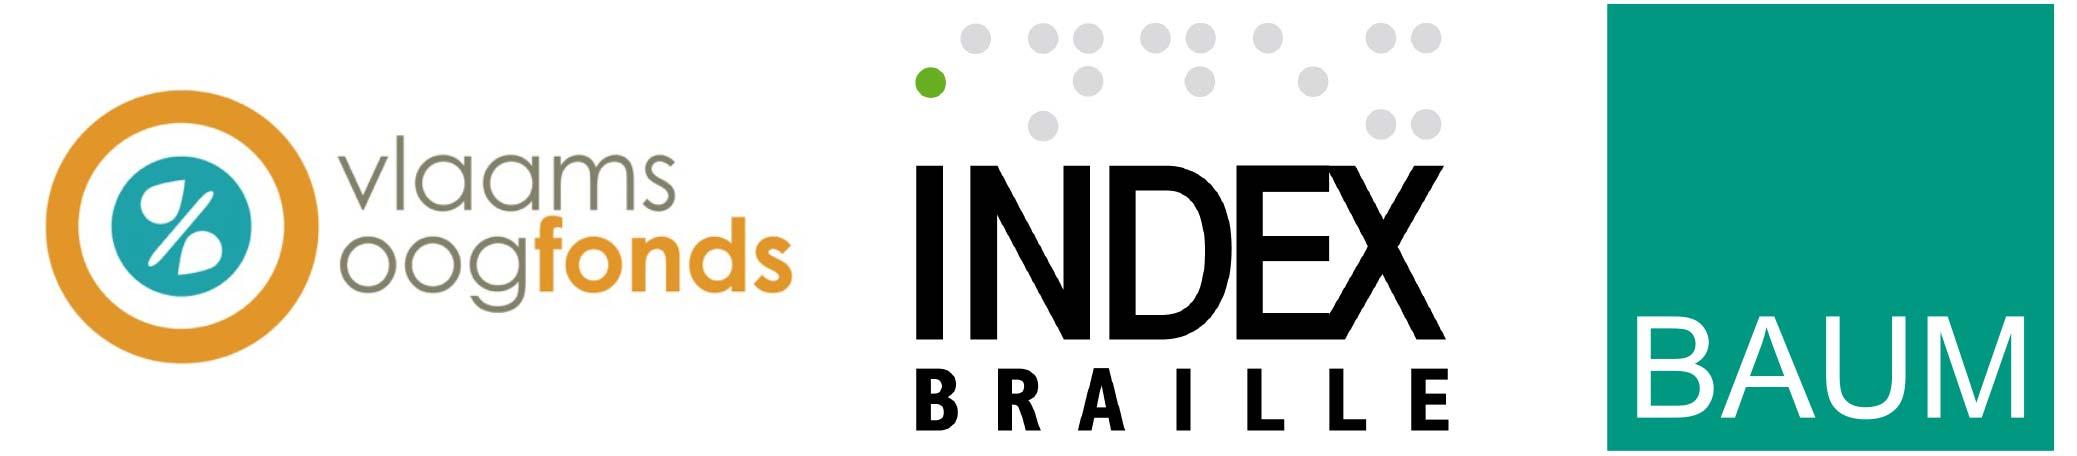 ICEVI Gold sponsors: VlaamsOogfonds, Index Braille, BAUM